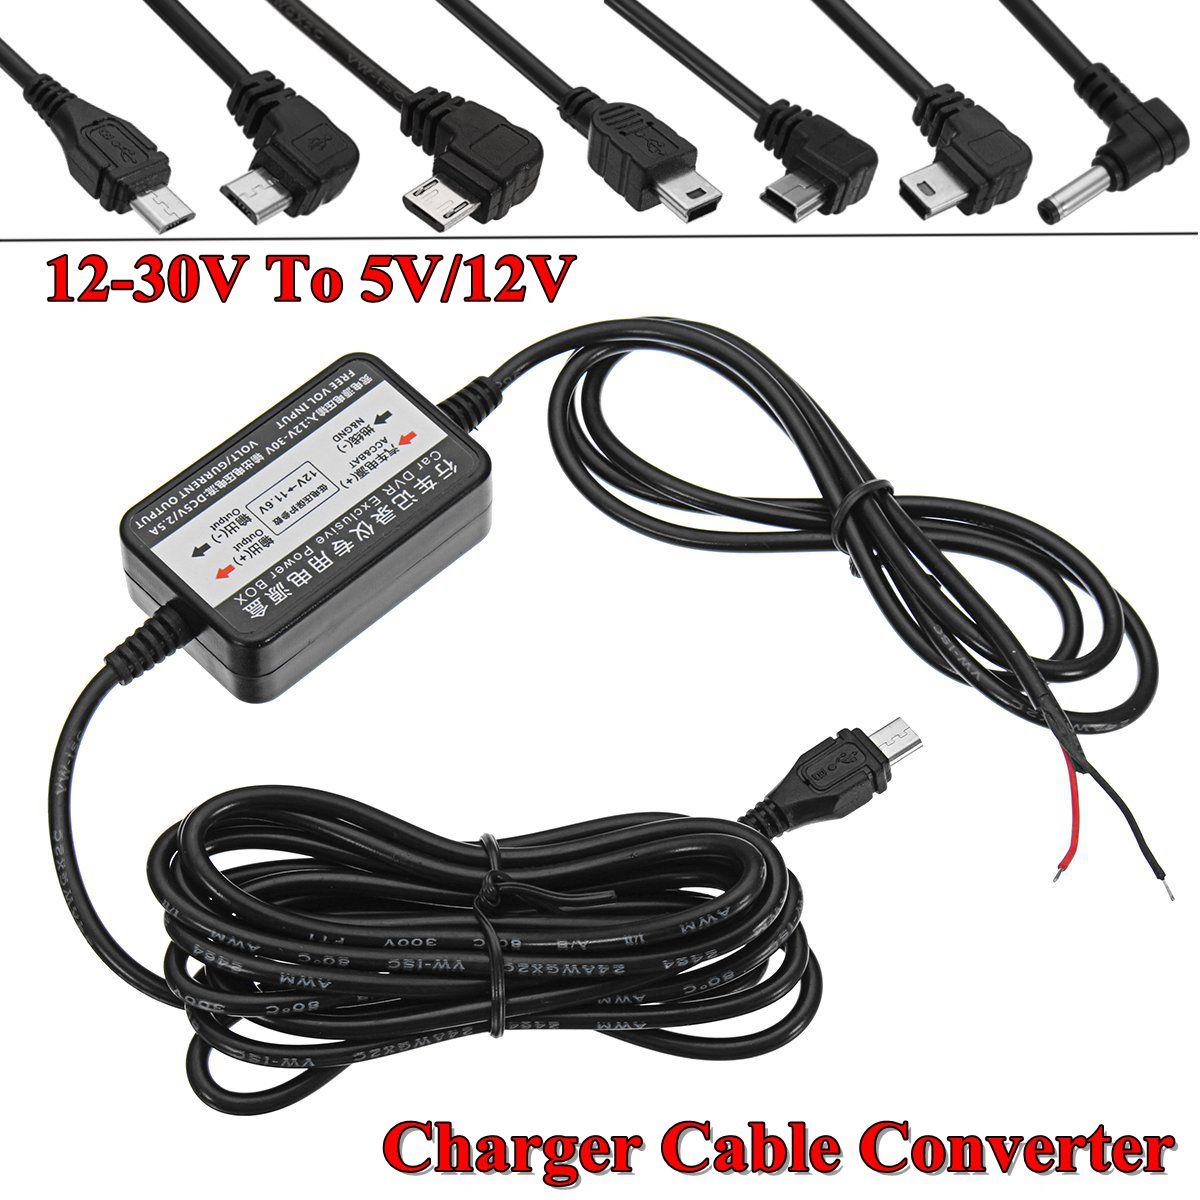 3.5mmm USB inversor de corriente recta izquierda/derecha Micro USB interfaz 12-30V a 5V 12V Cable Convertidor para el coche DVR adaptador de cámara